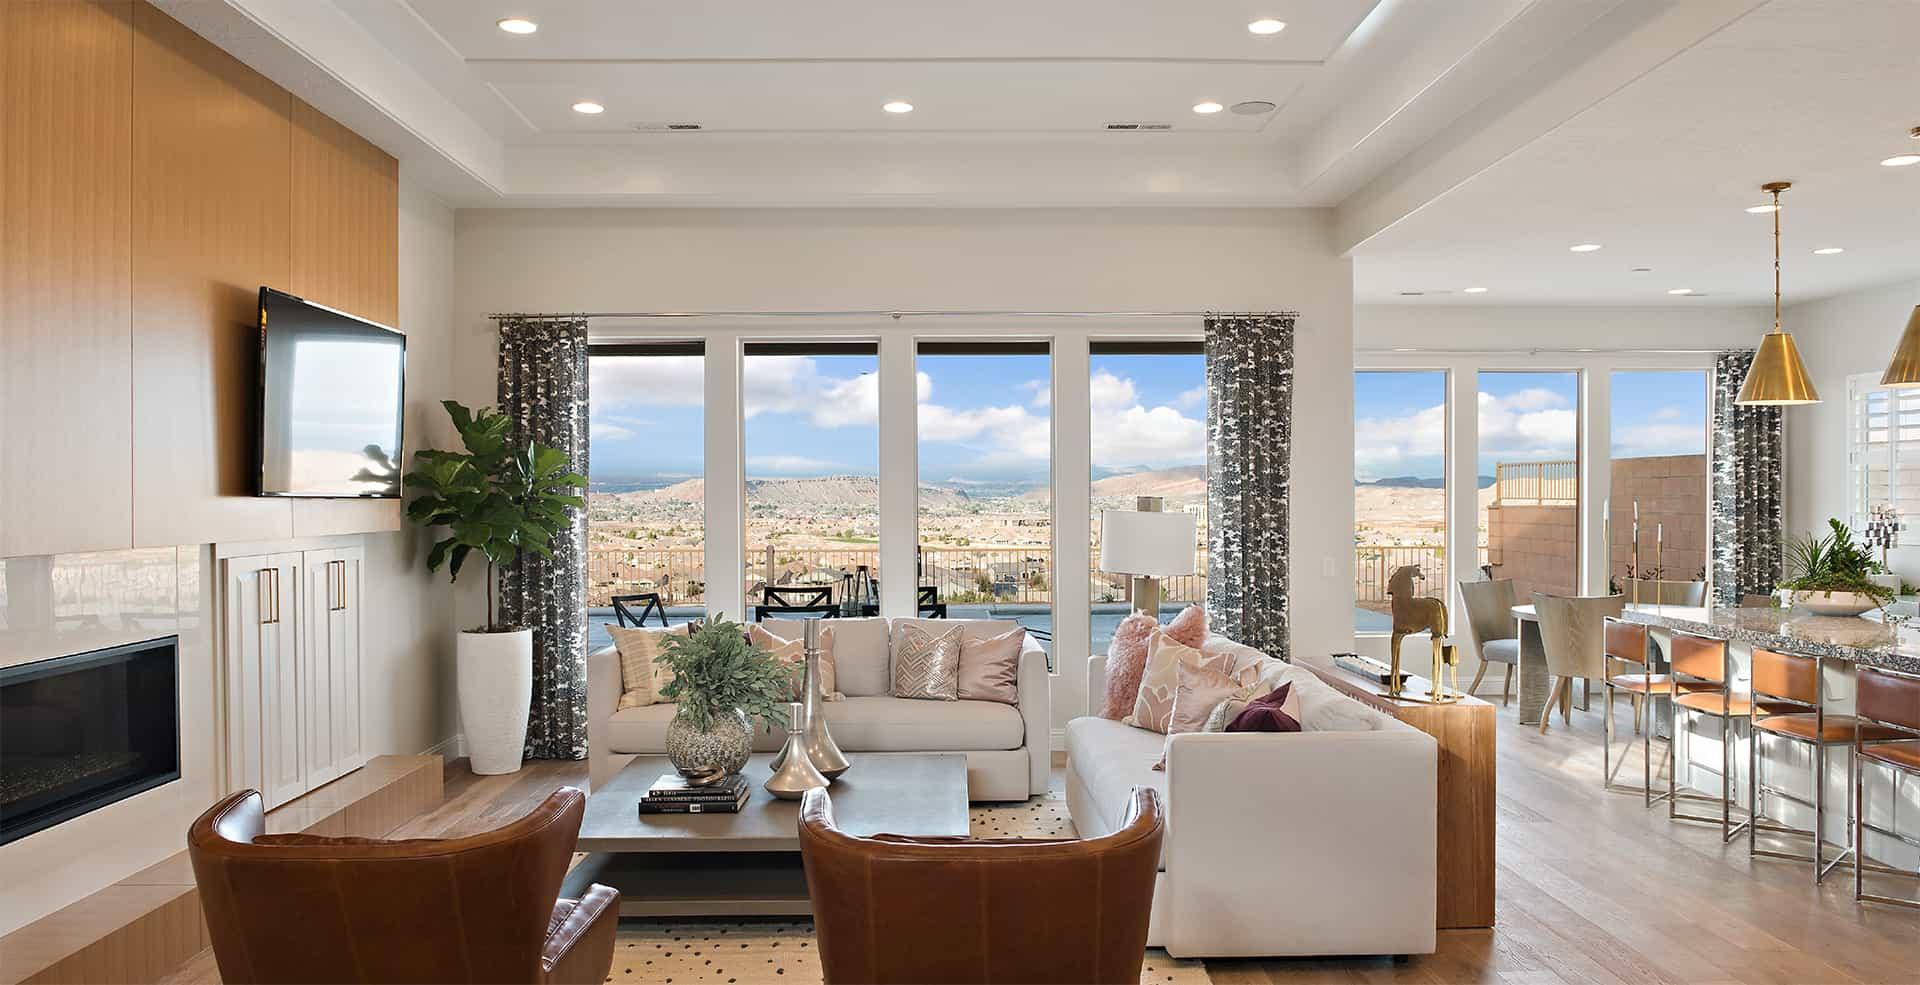 Jones Paint & Glass Windows Utah